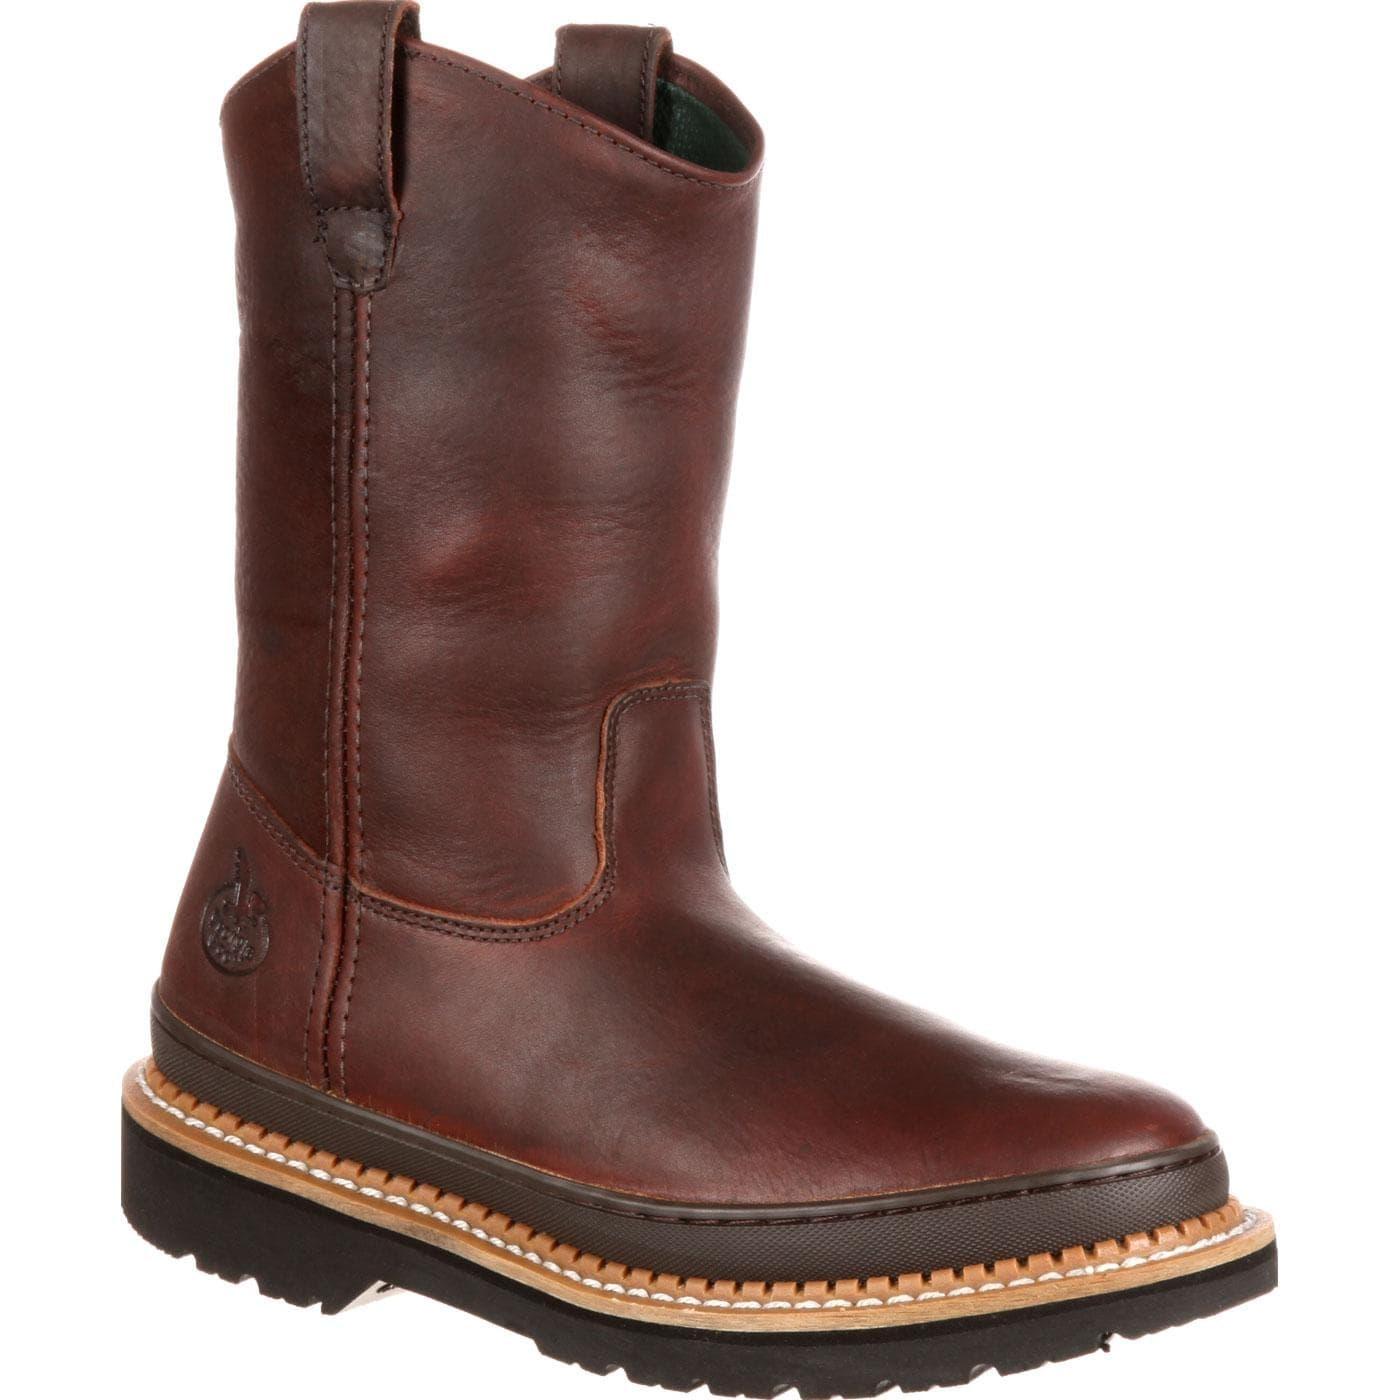 Work Boot - Georgia Boot #G4274